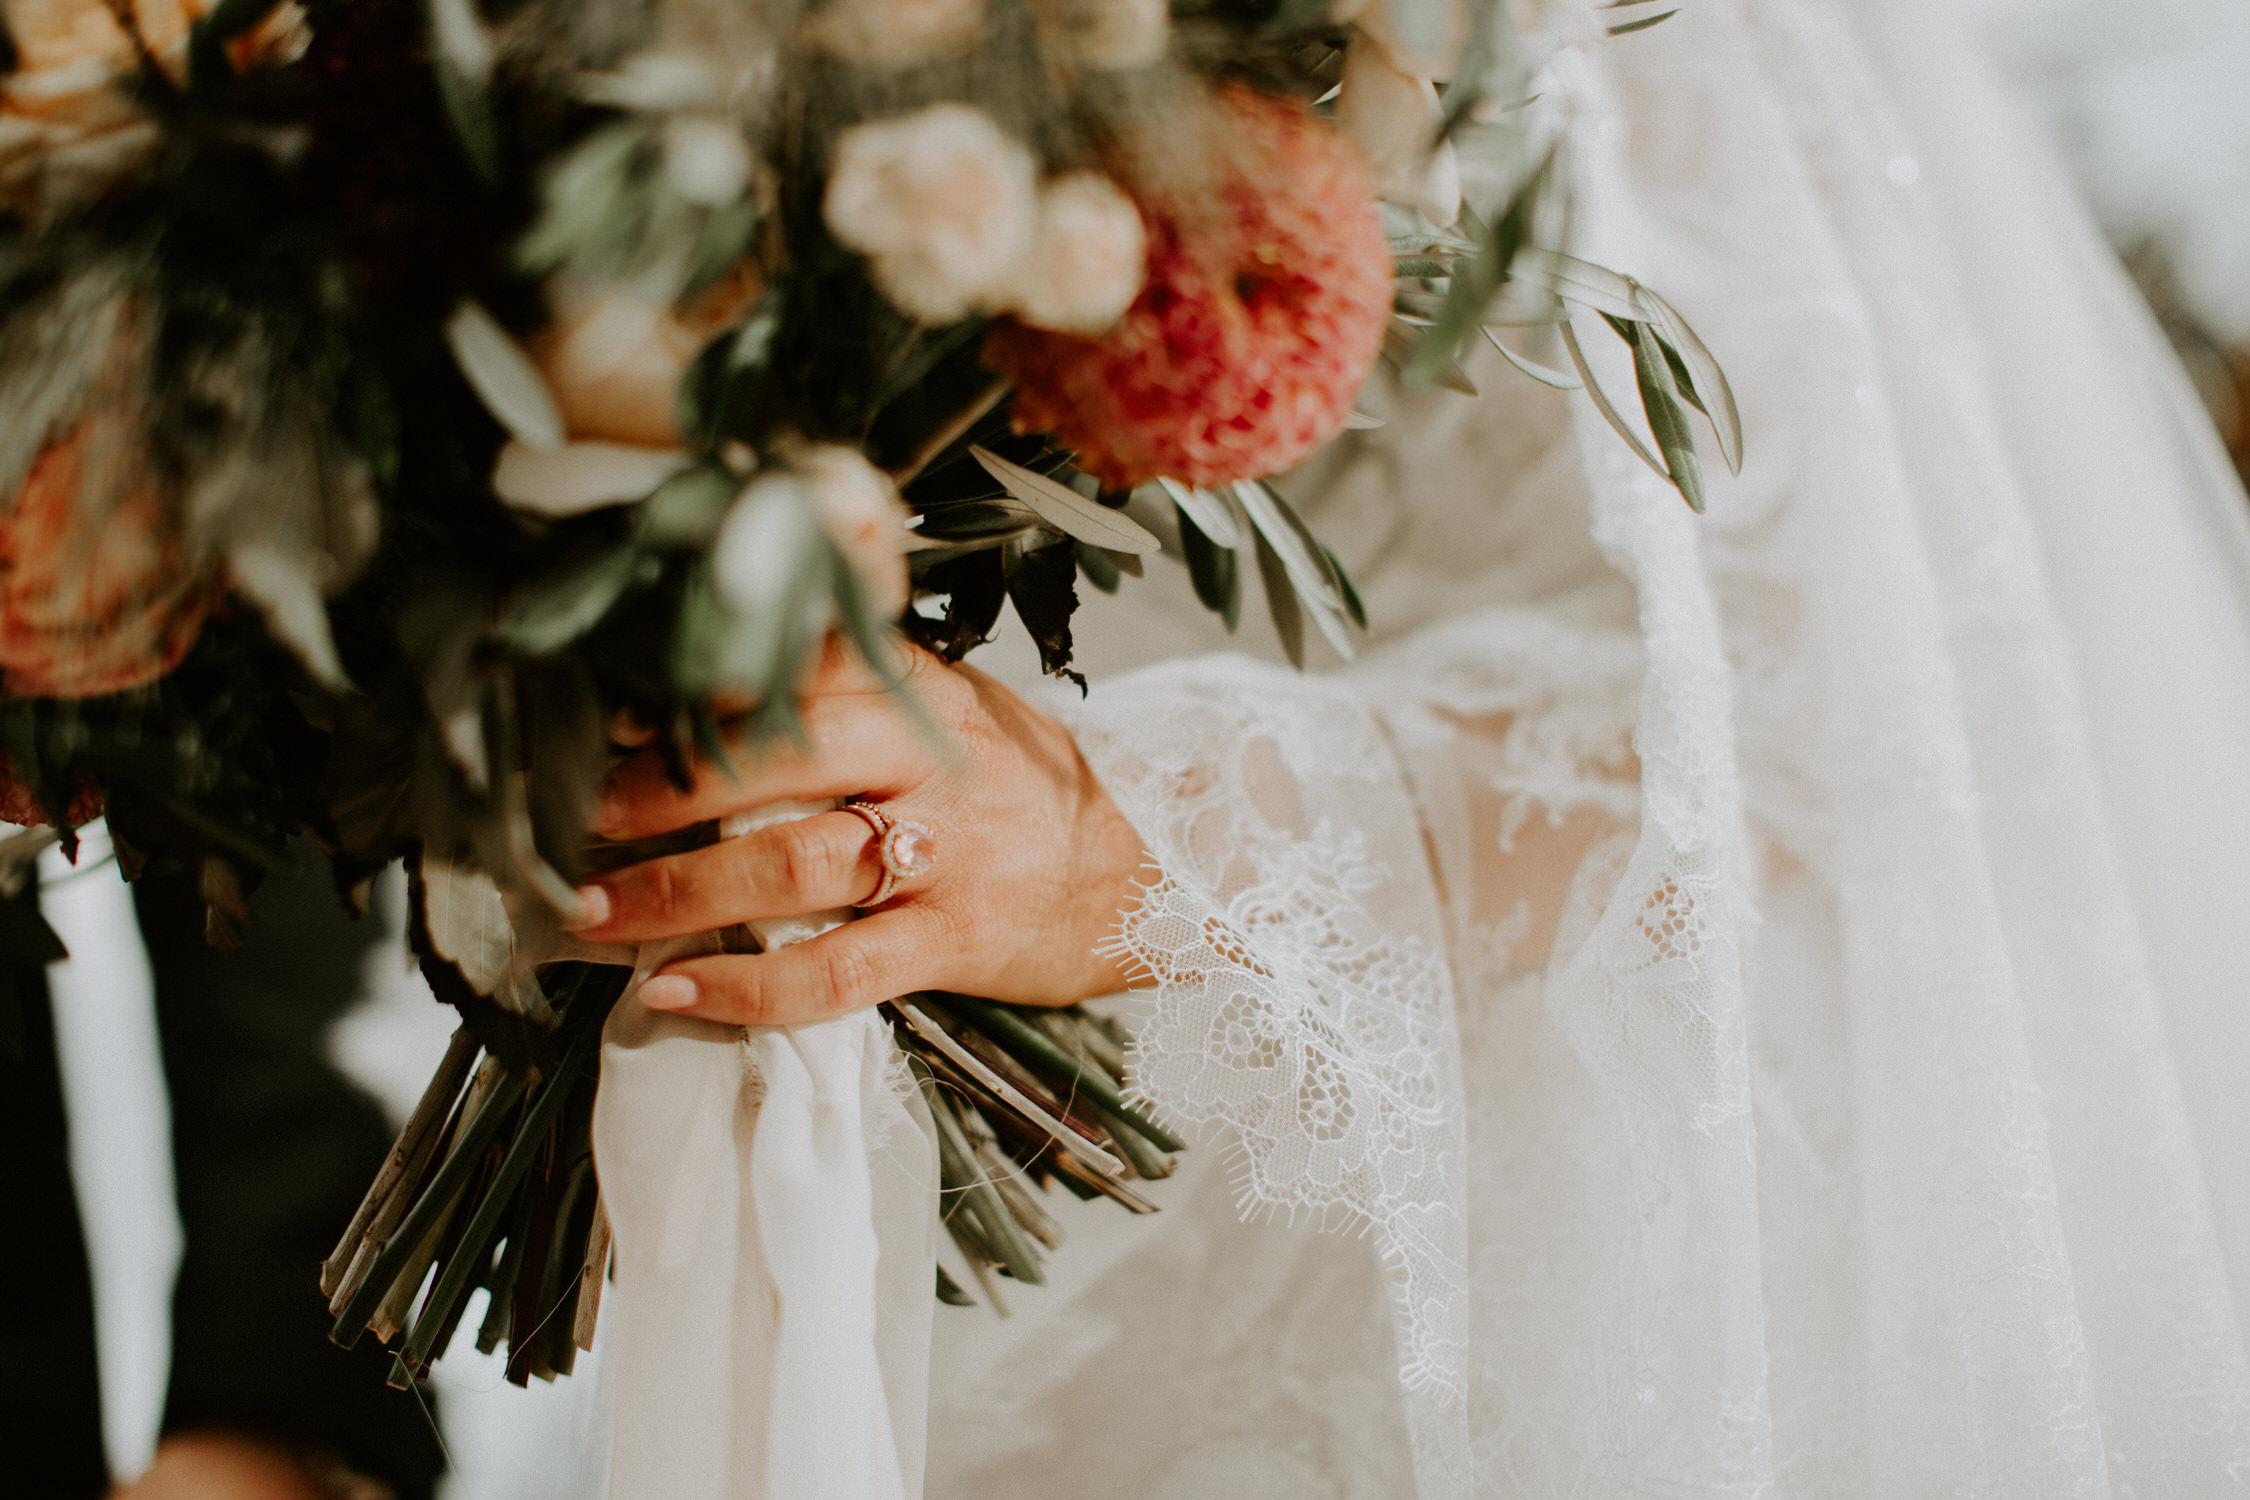 couple-intimate-wedding-temecula-661.jpg